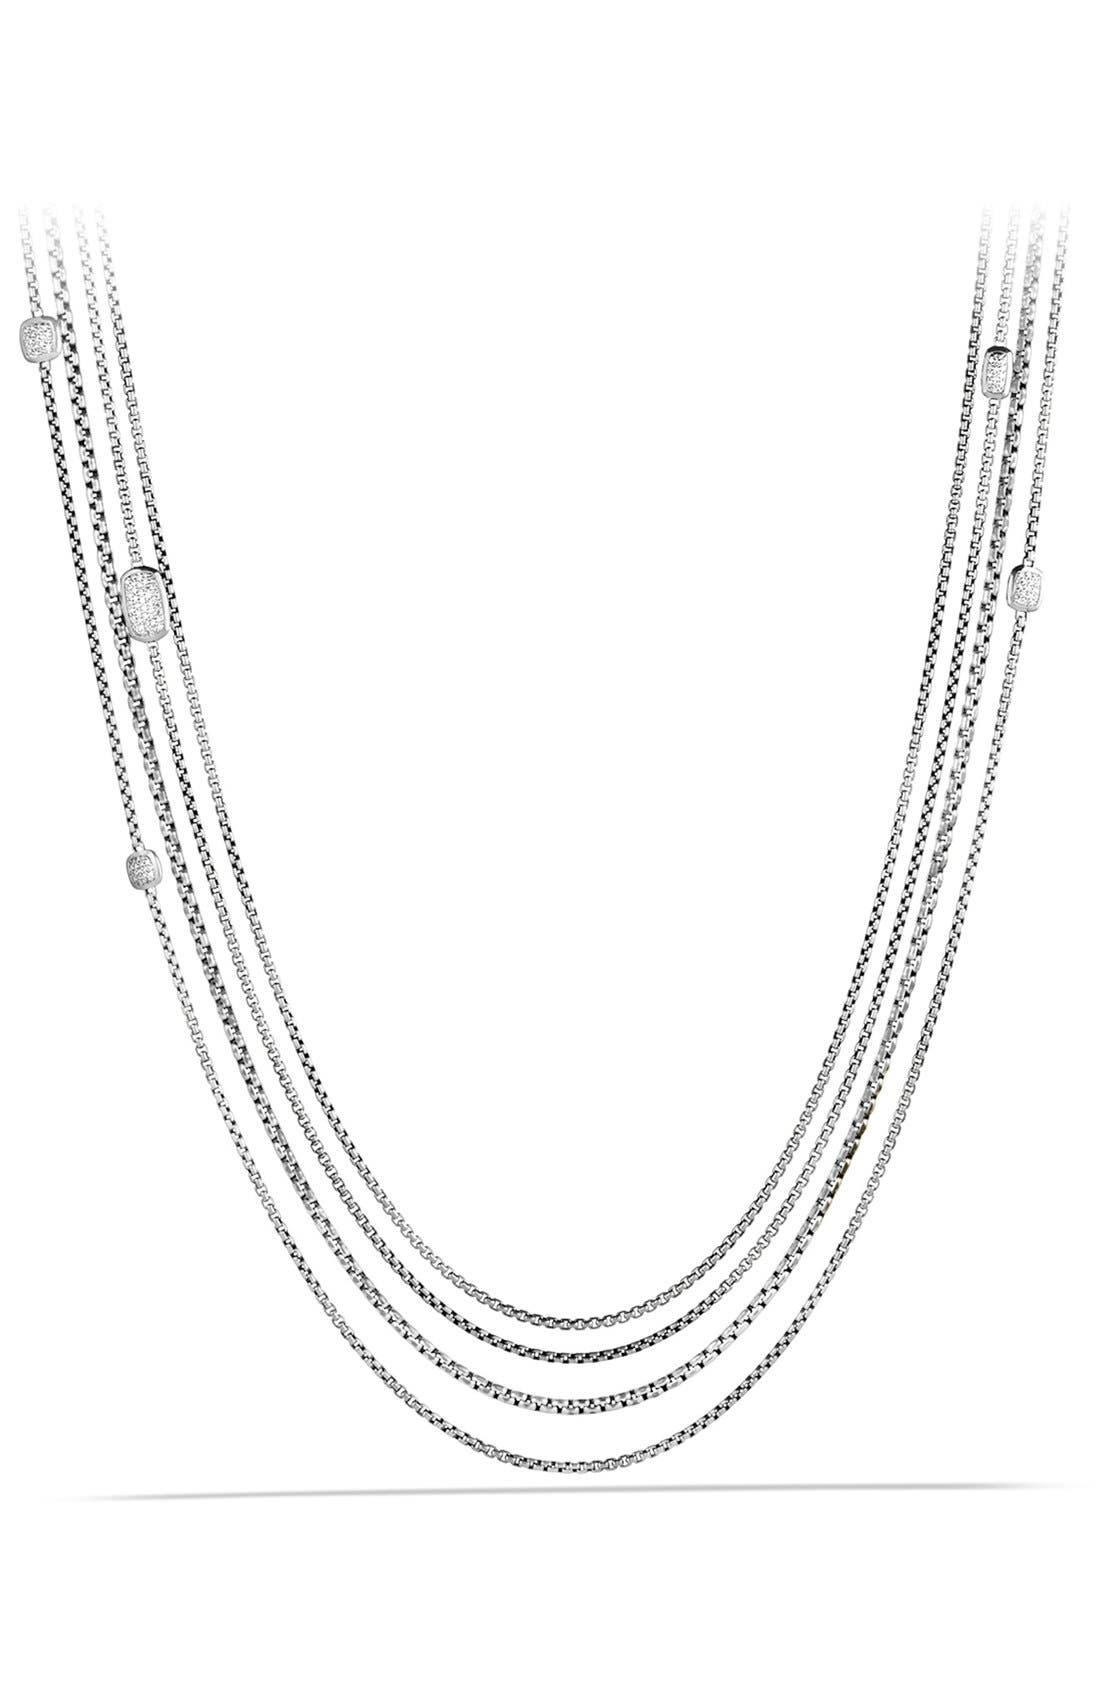 DAVID YURMAN Confetti Station Necklace with Diamonds